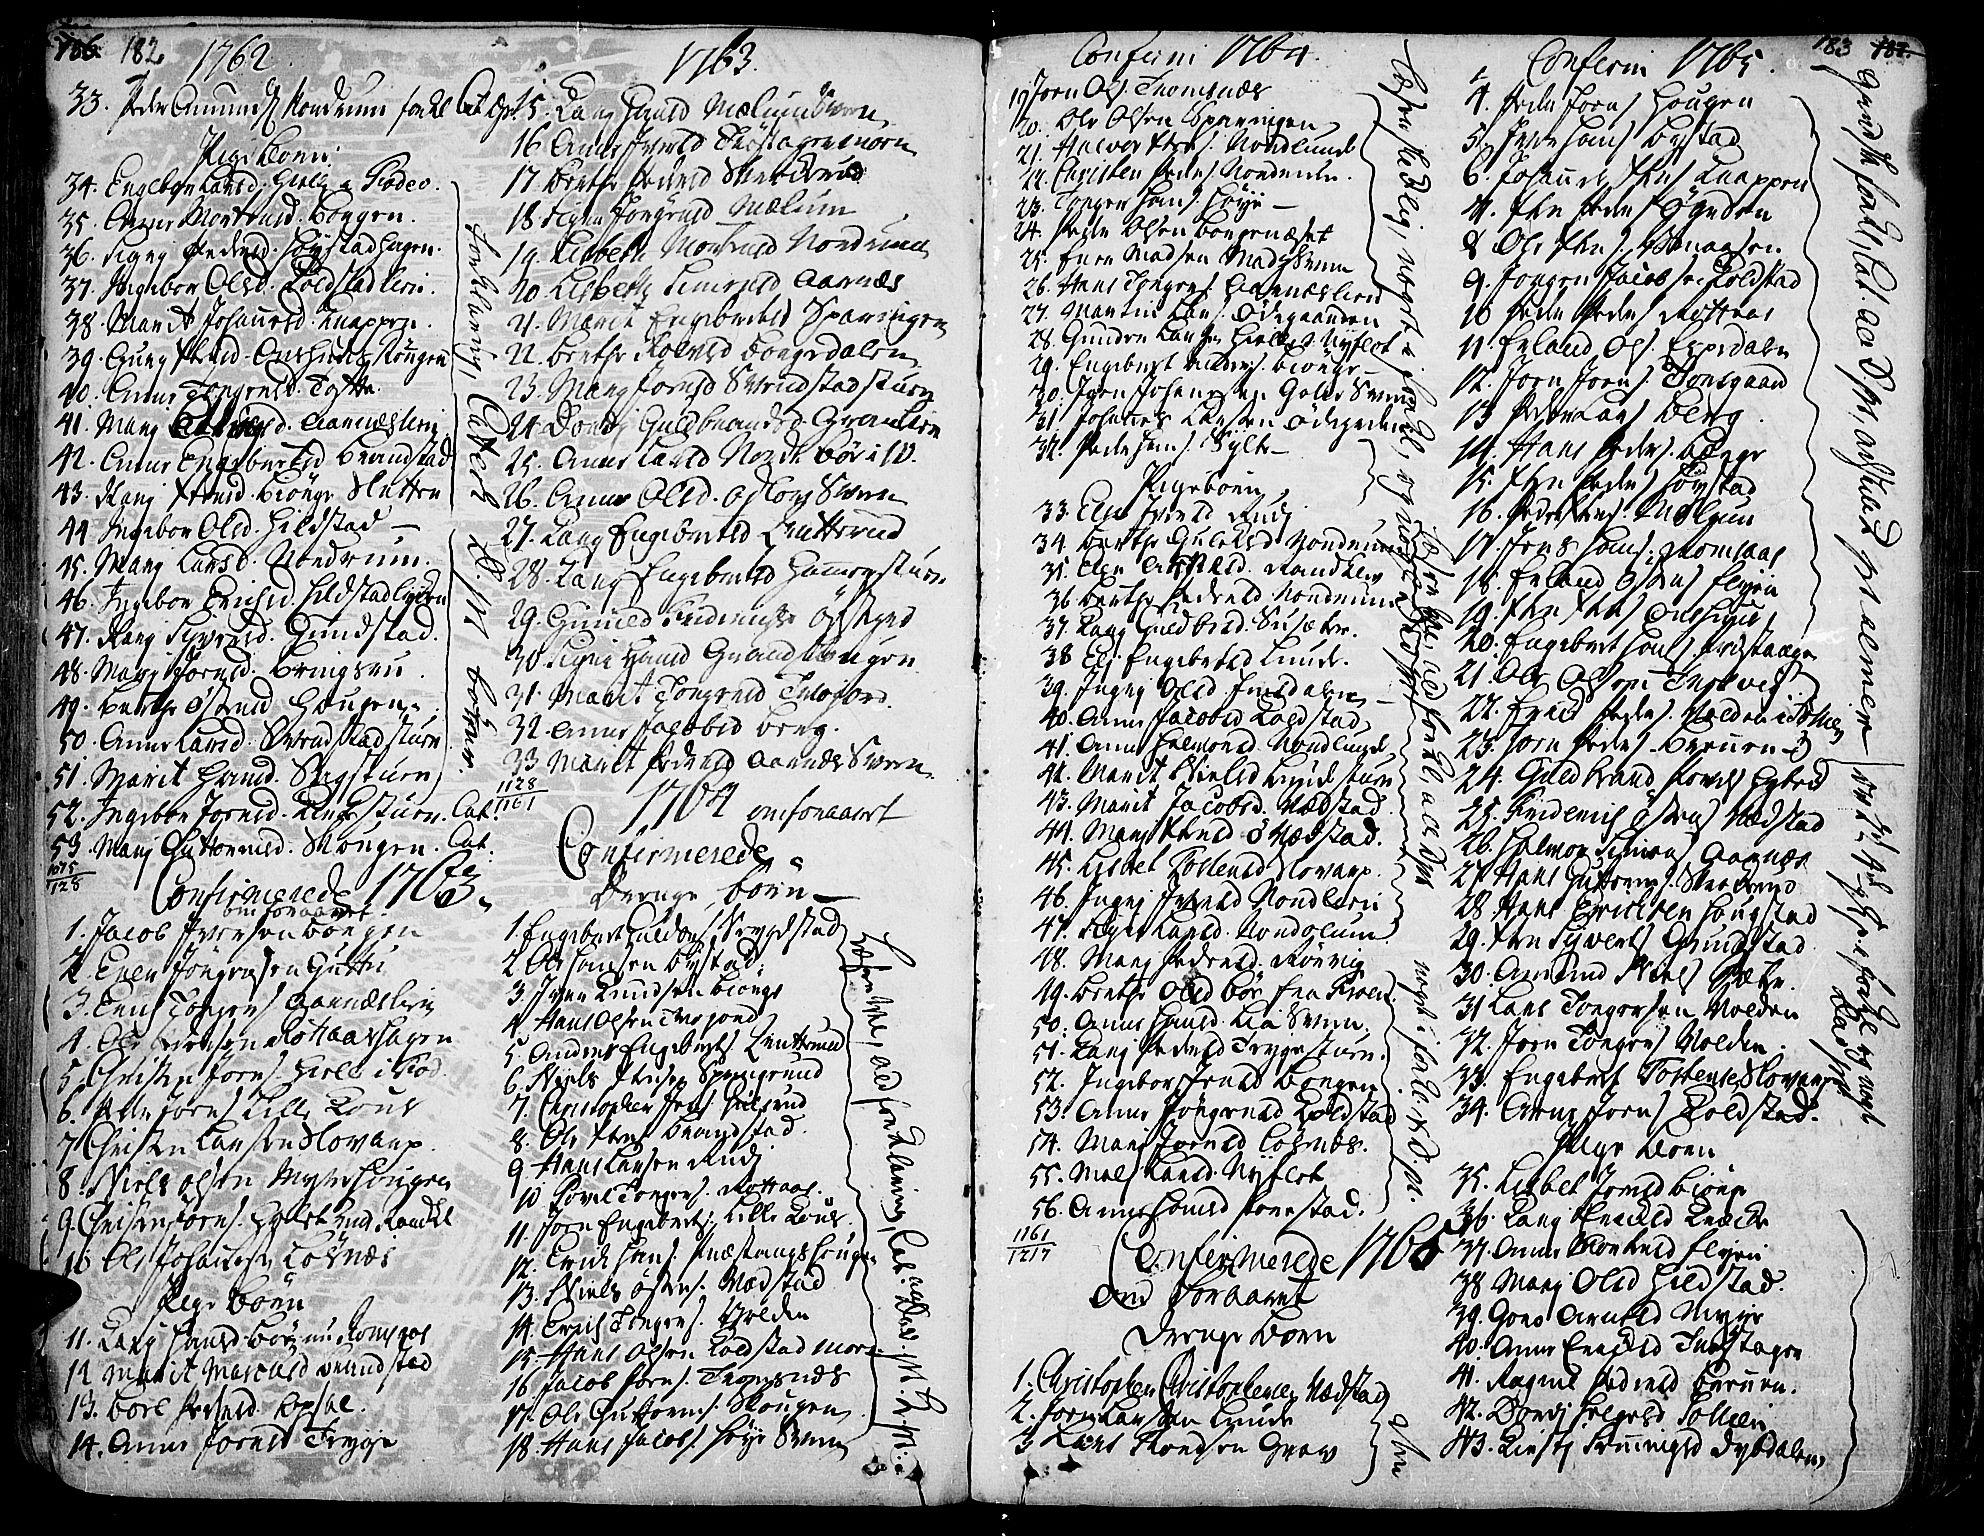 SAH, Ringebu prestekontor, Ministerialbok nr. 2, 1734-1780, s. 182-183